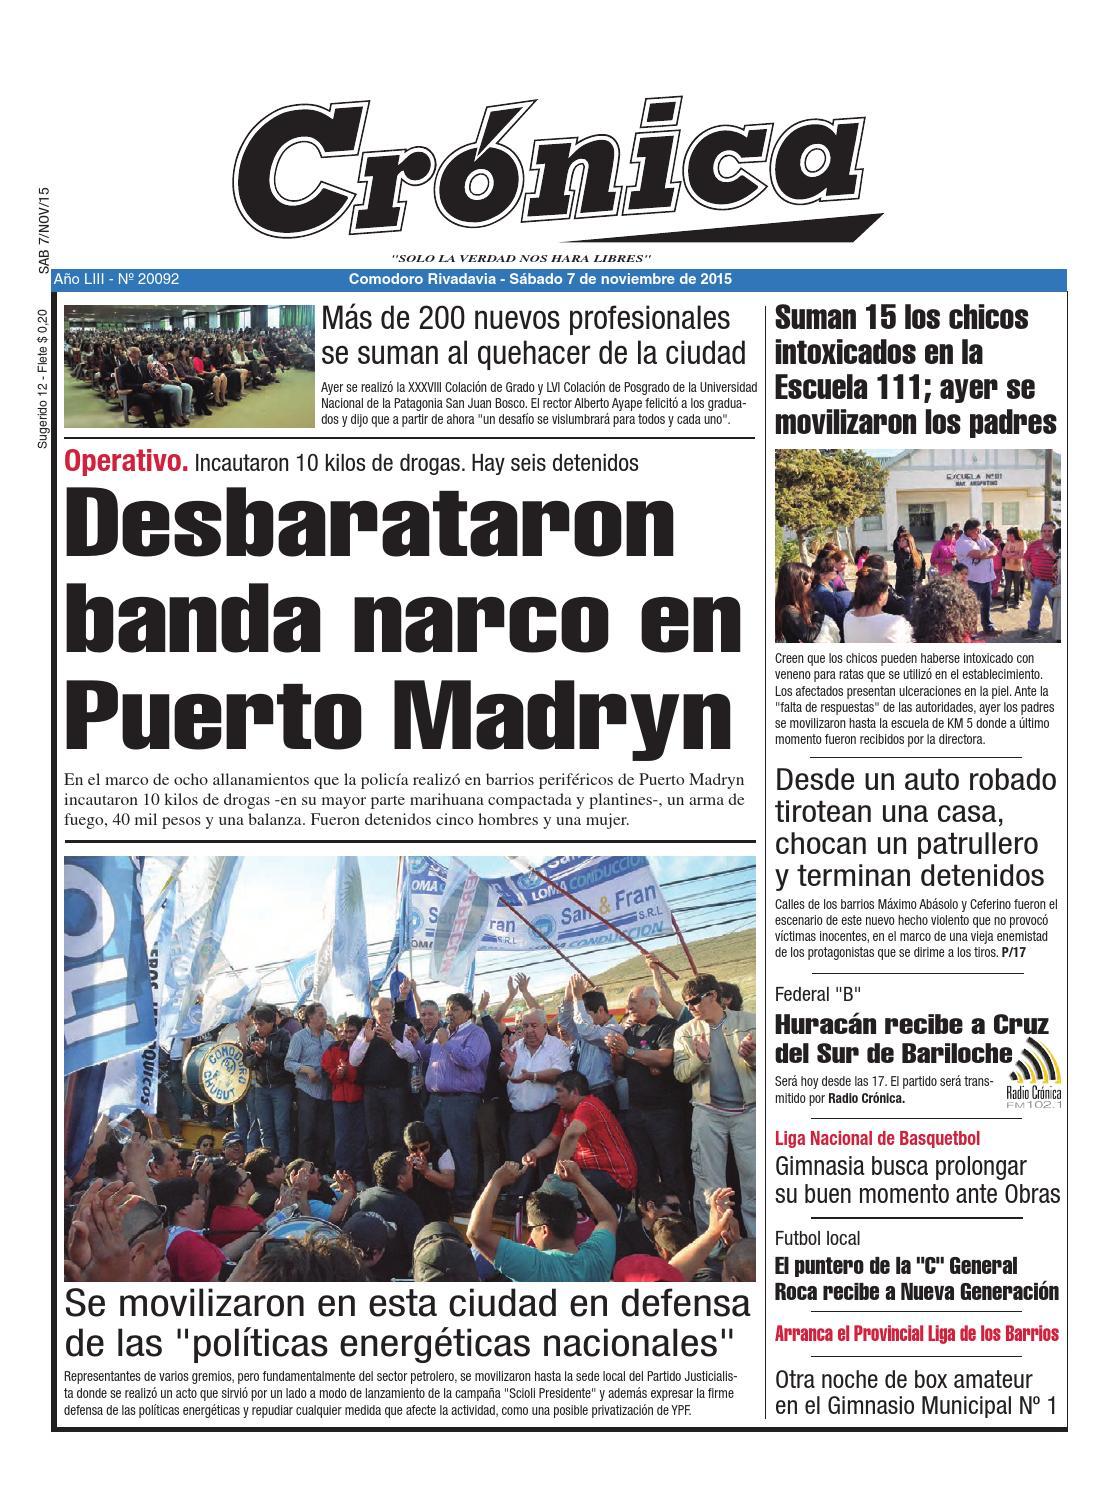 7e9d4c1b37822a7fae60e3bb7610ee56 by Diario Crónica - issuu